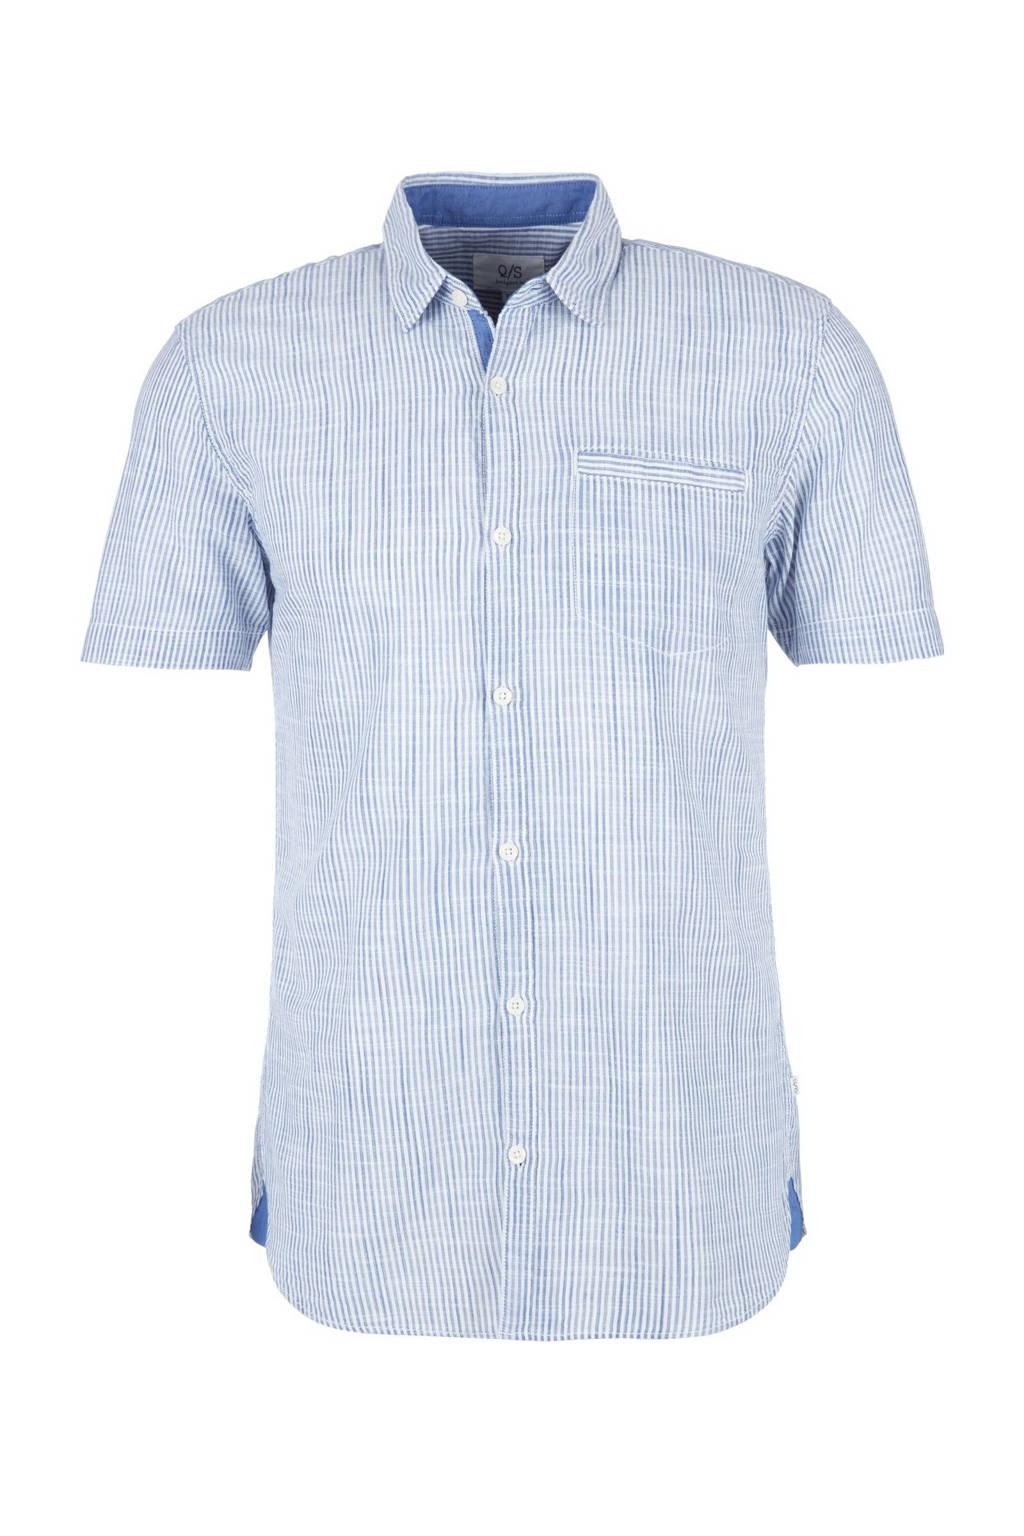 Q/S designed by gestreept regular fit overhemd blauw/wit, Blauw/wit